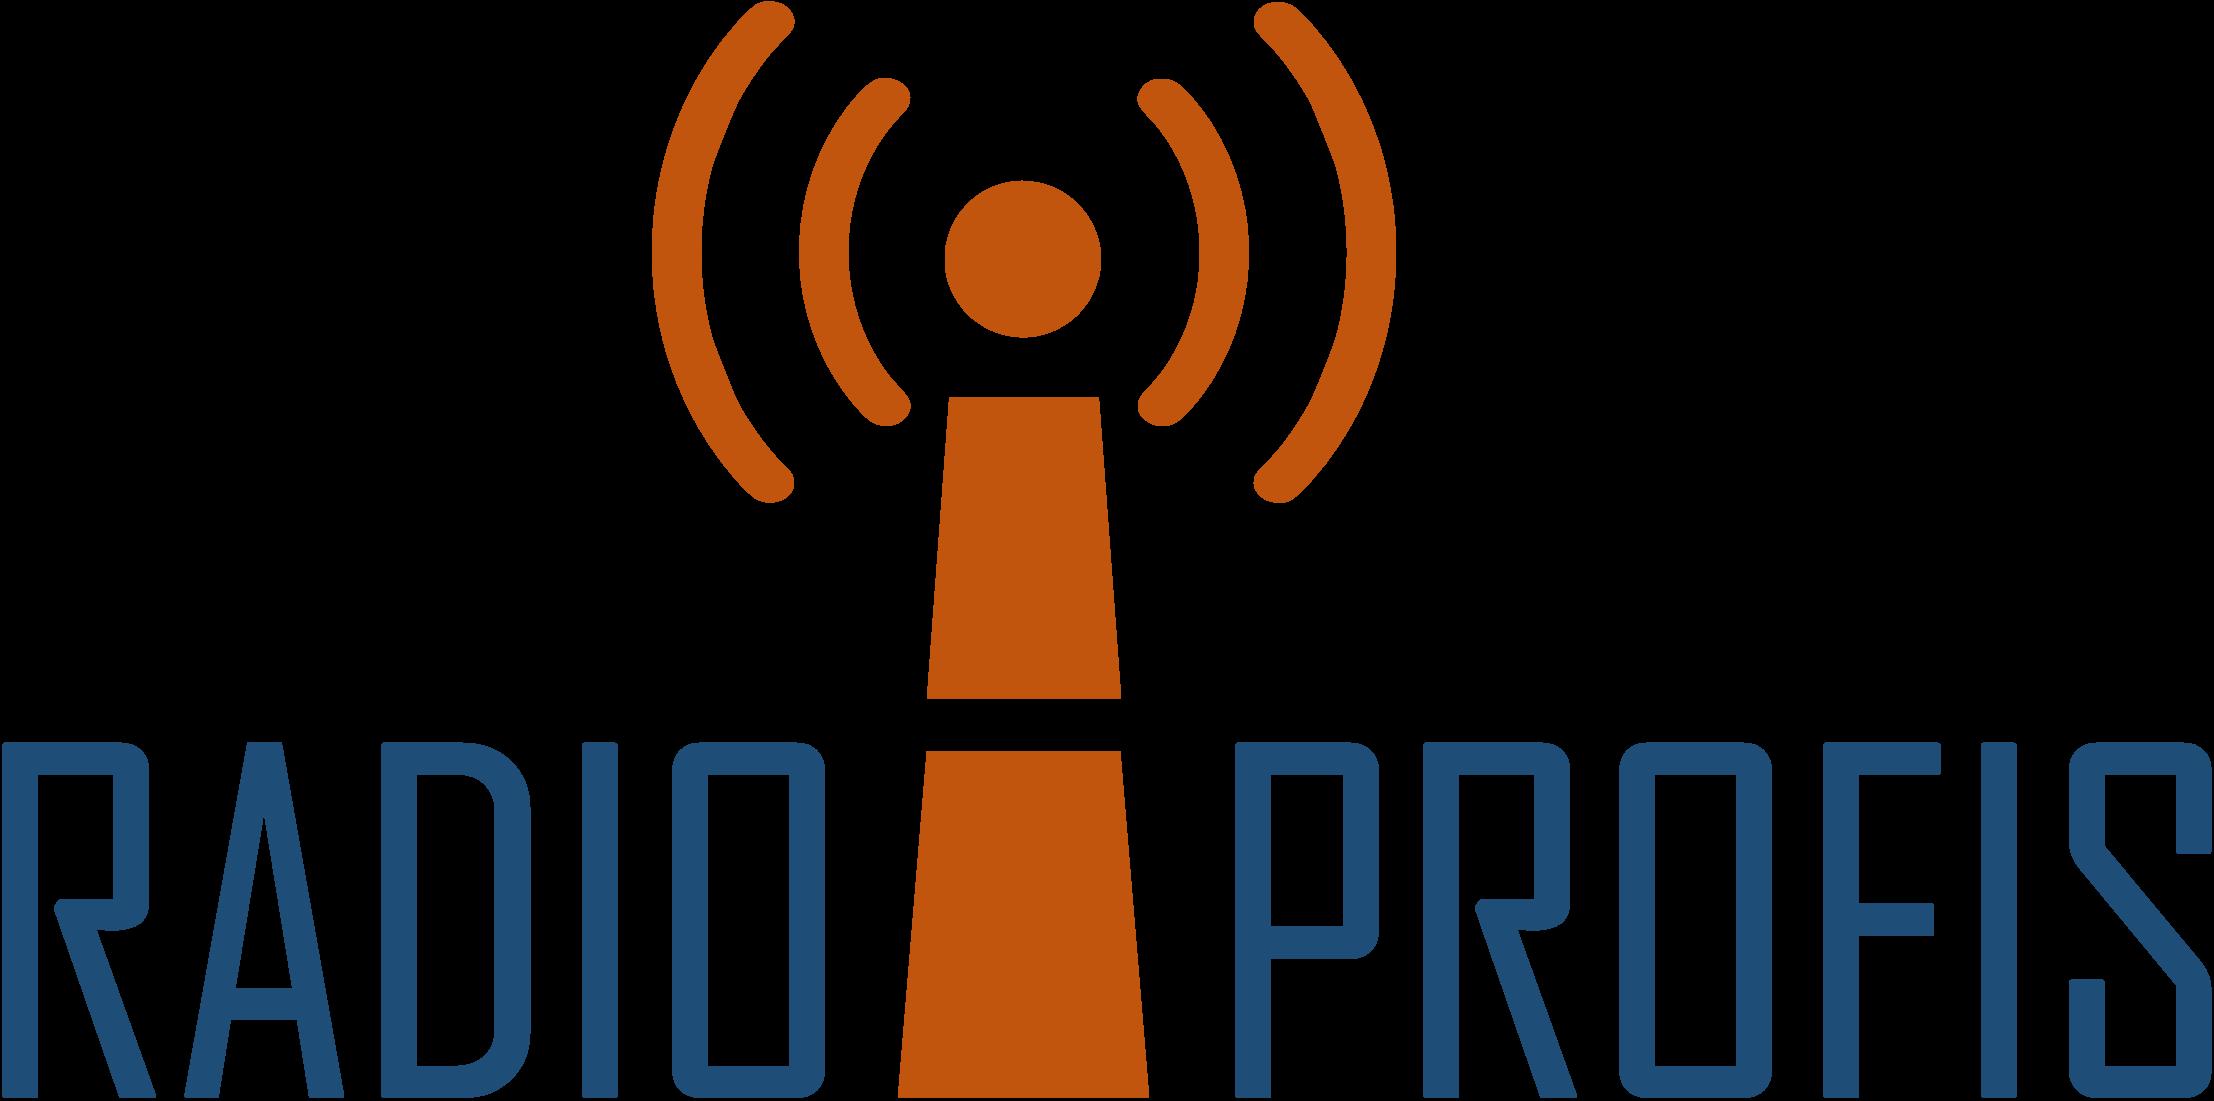 Radioprofis Logo